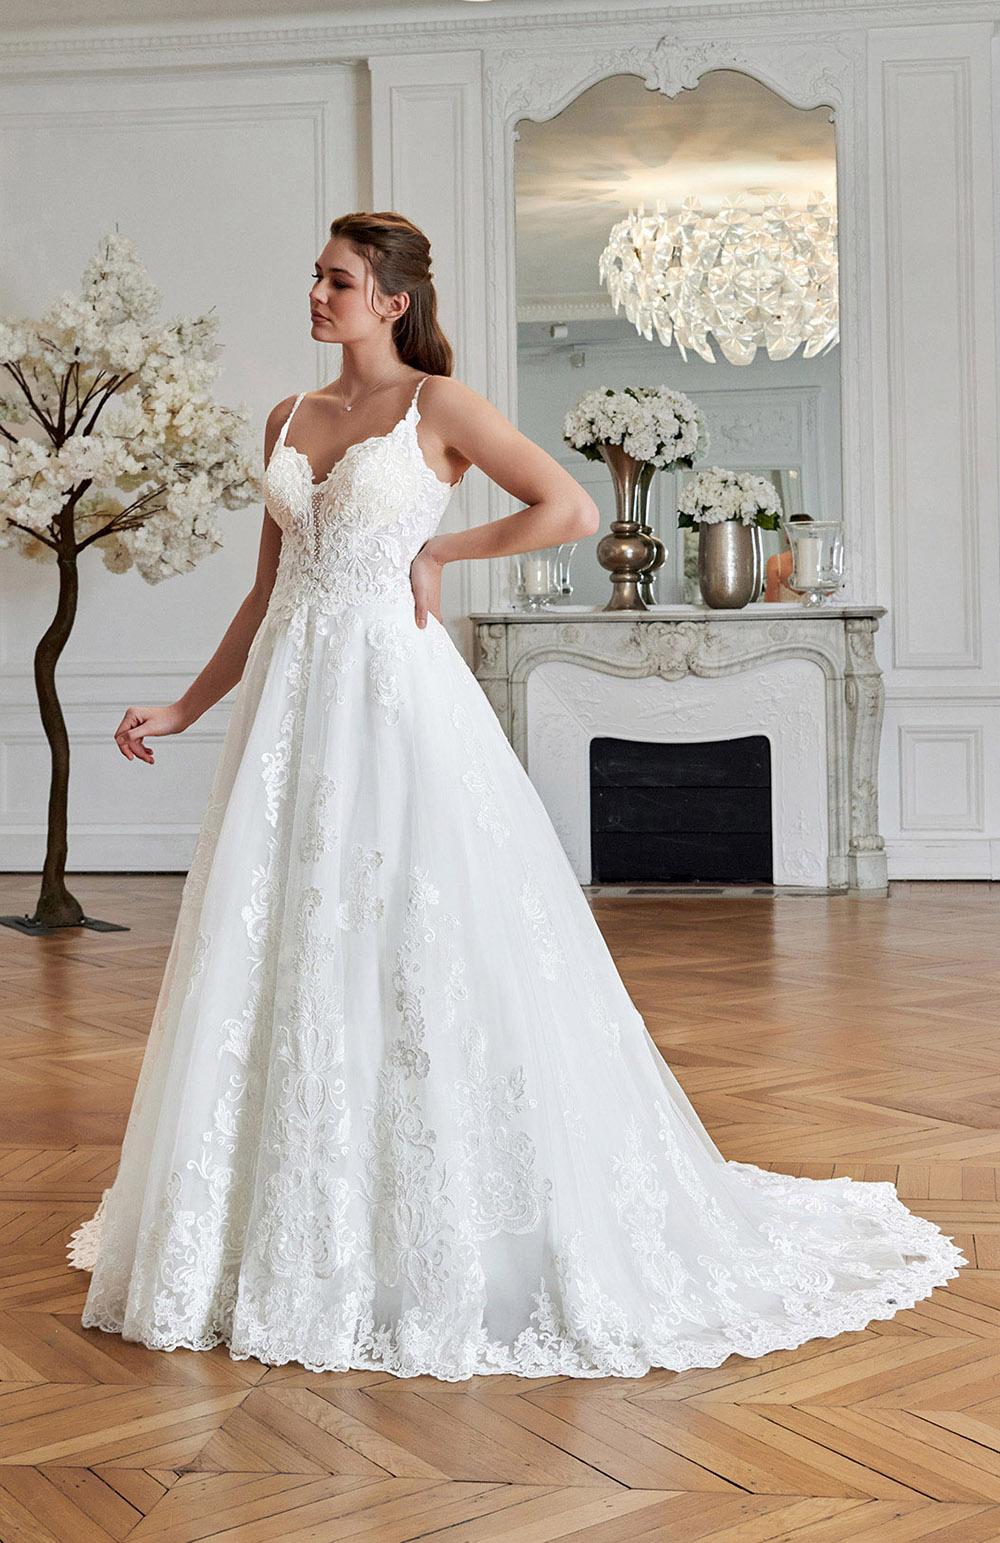 Robe de mariée Modèle Evana